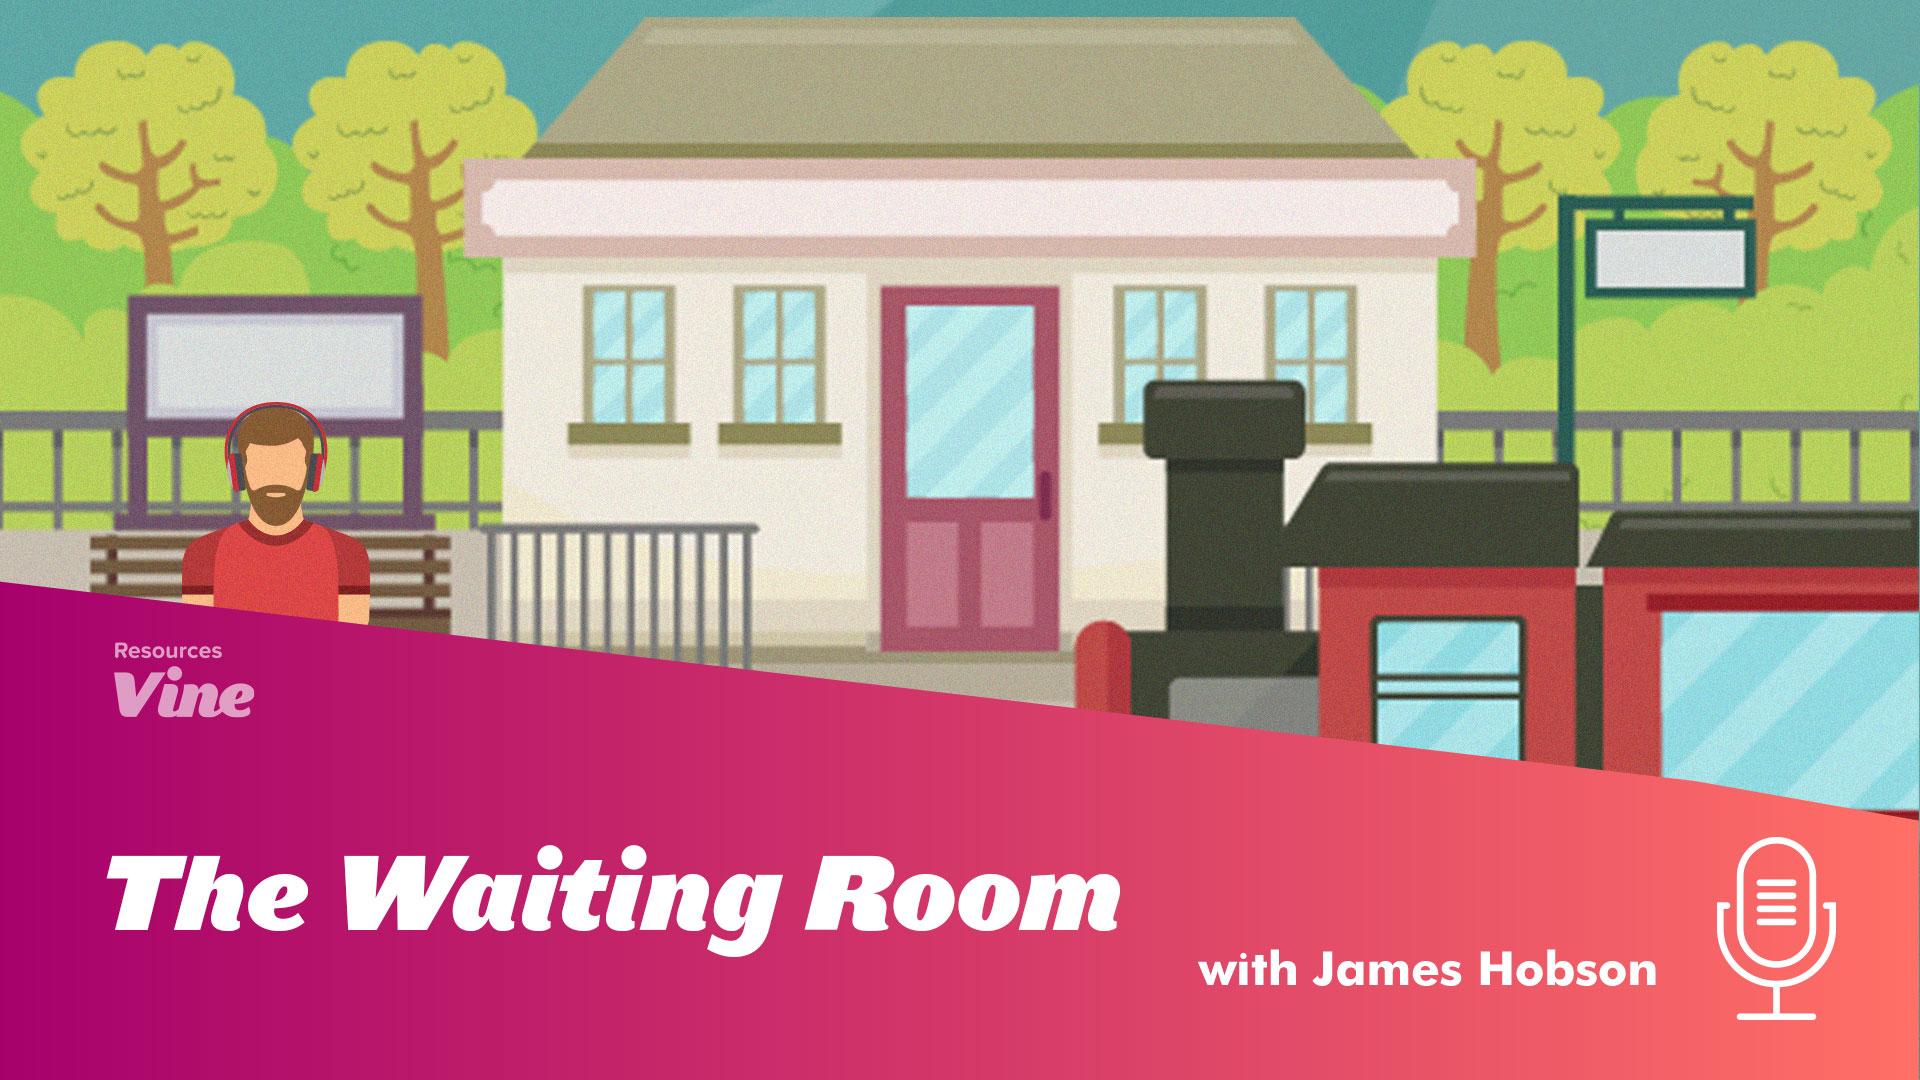 Thumbnail_The_Waiting_Room_JH